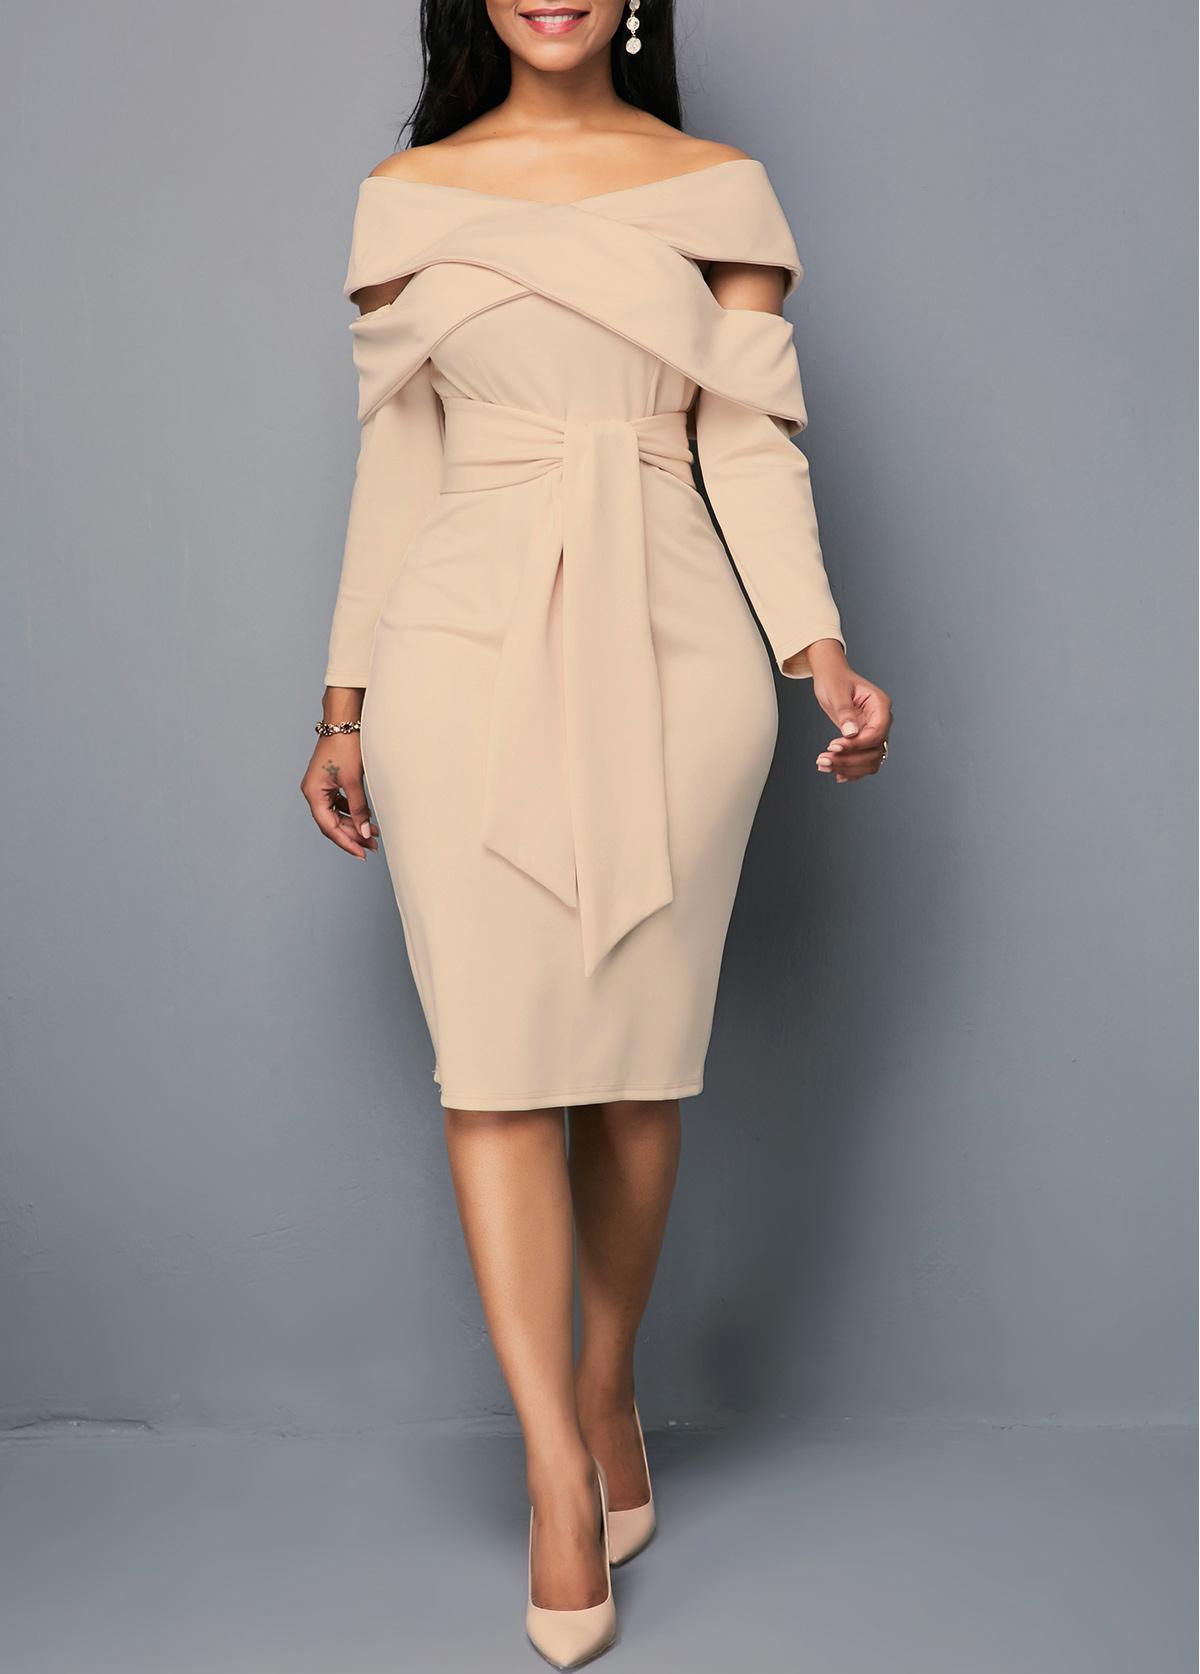 ROTITA Off the Shoulder Zipper Back Sheath Dress